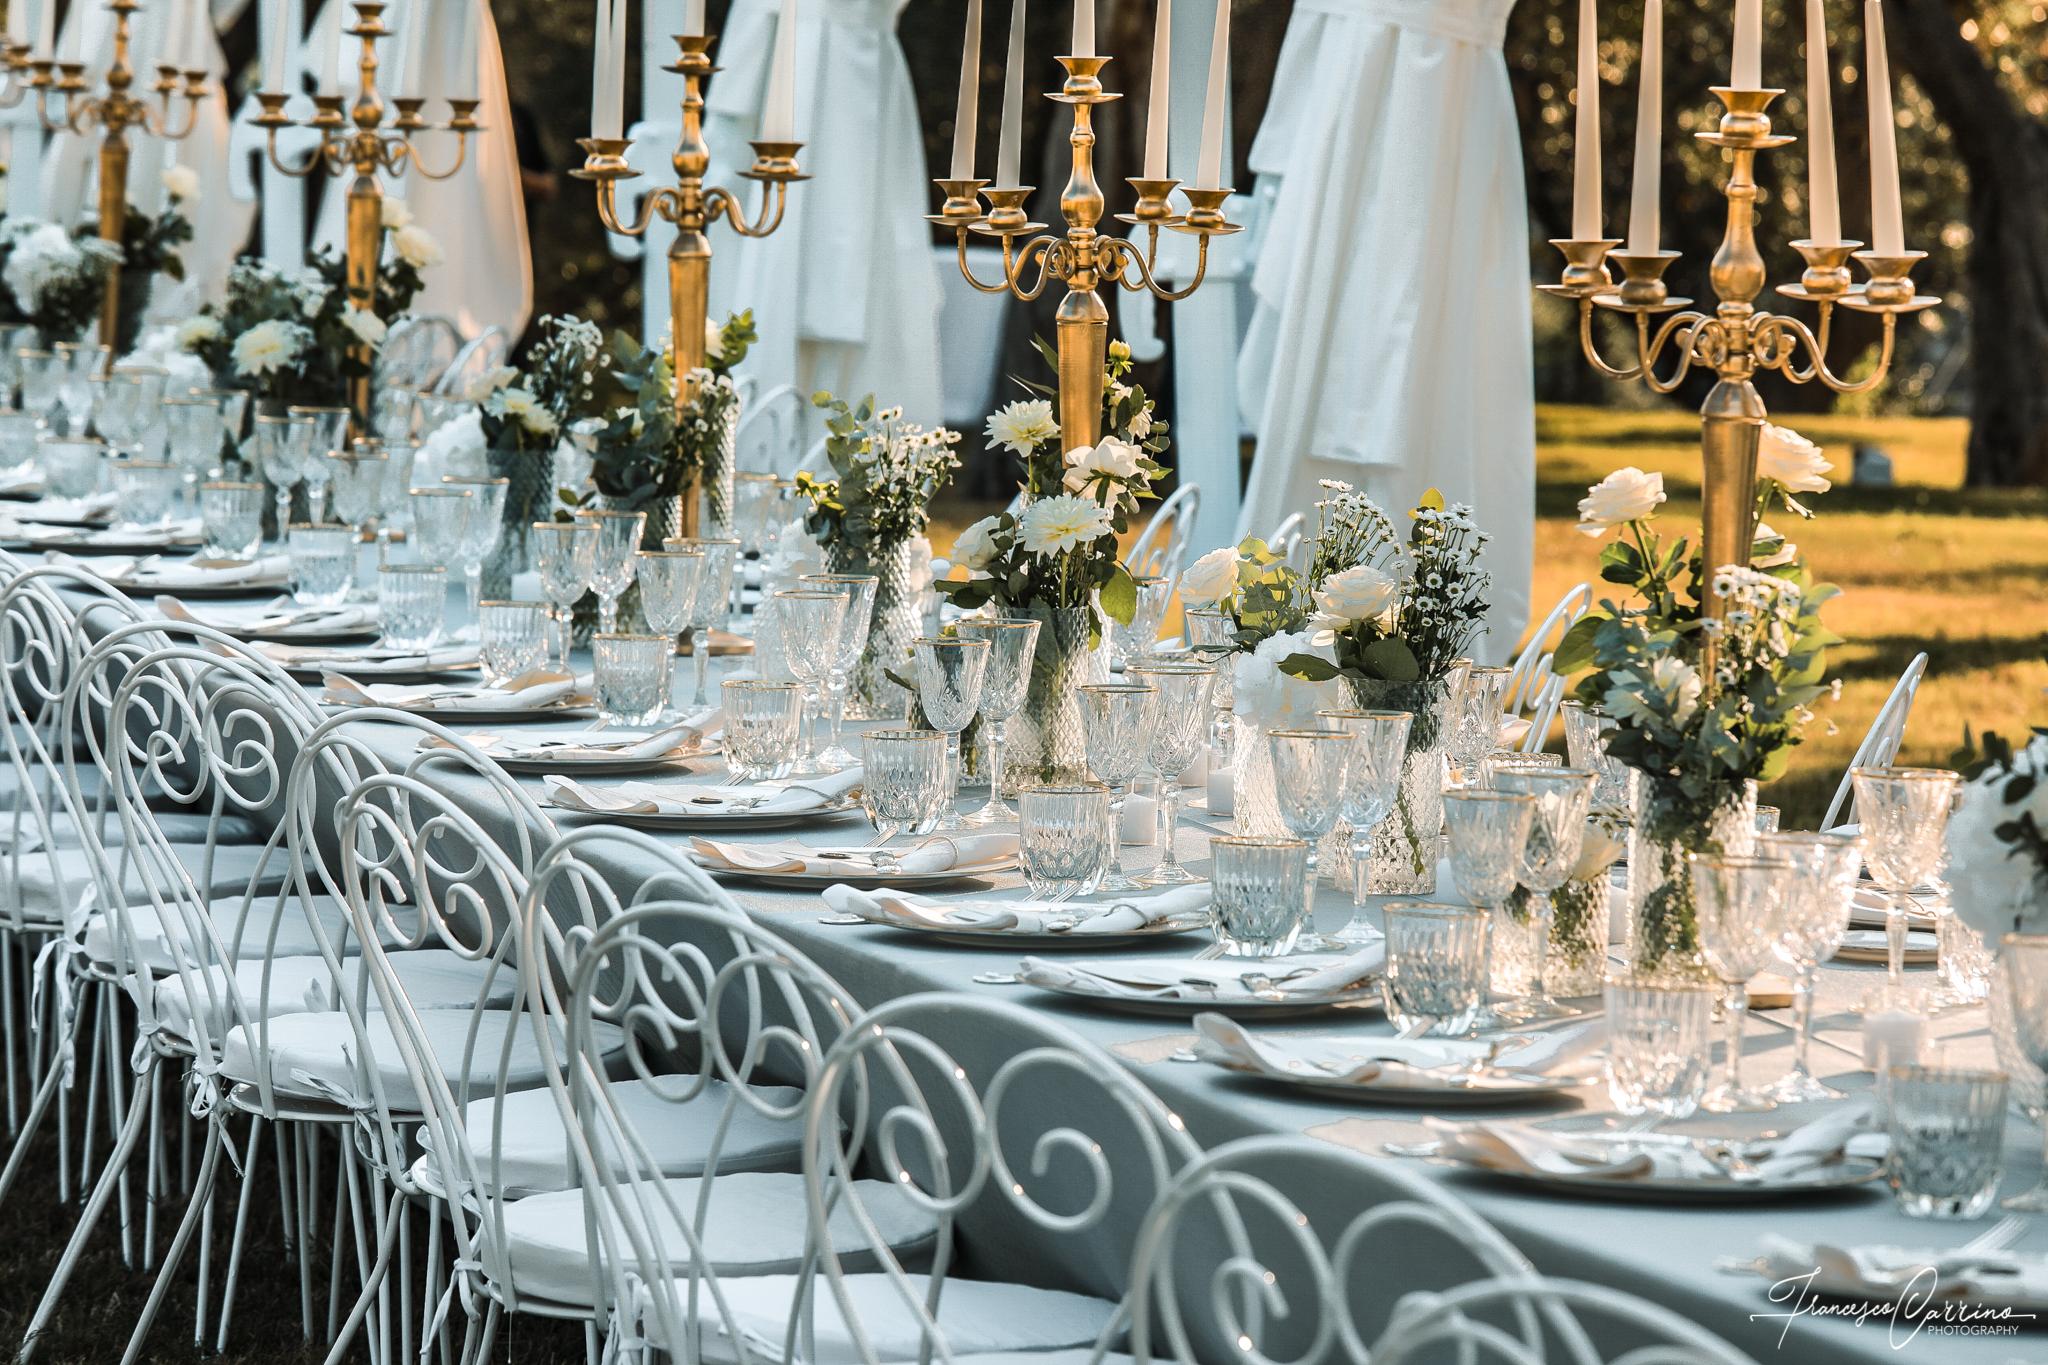 https://www.weddingamalfi.com/wp-content/uploads/Giannenza-13-luglio-2019-10.jpg